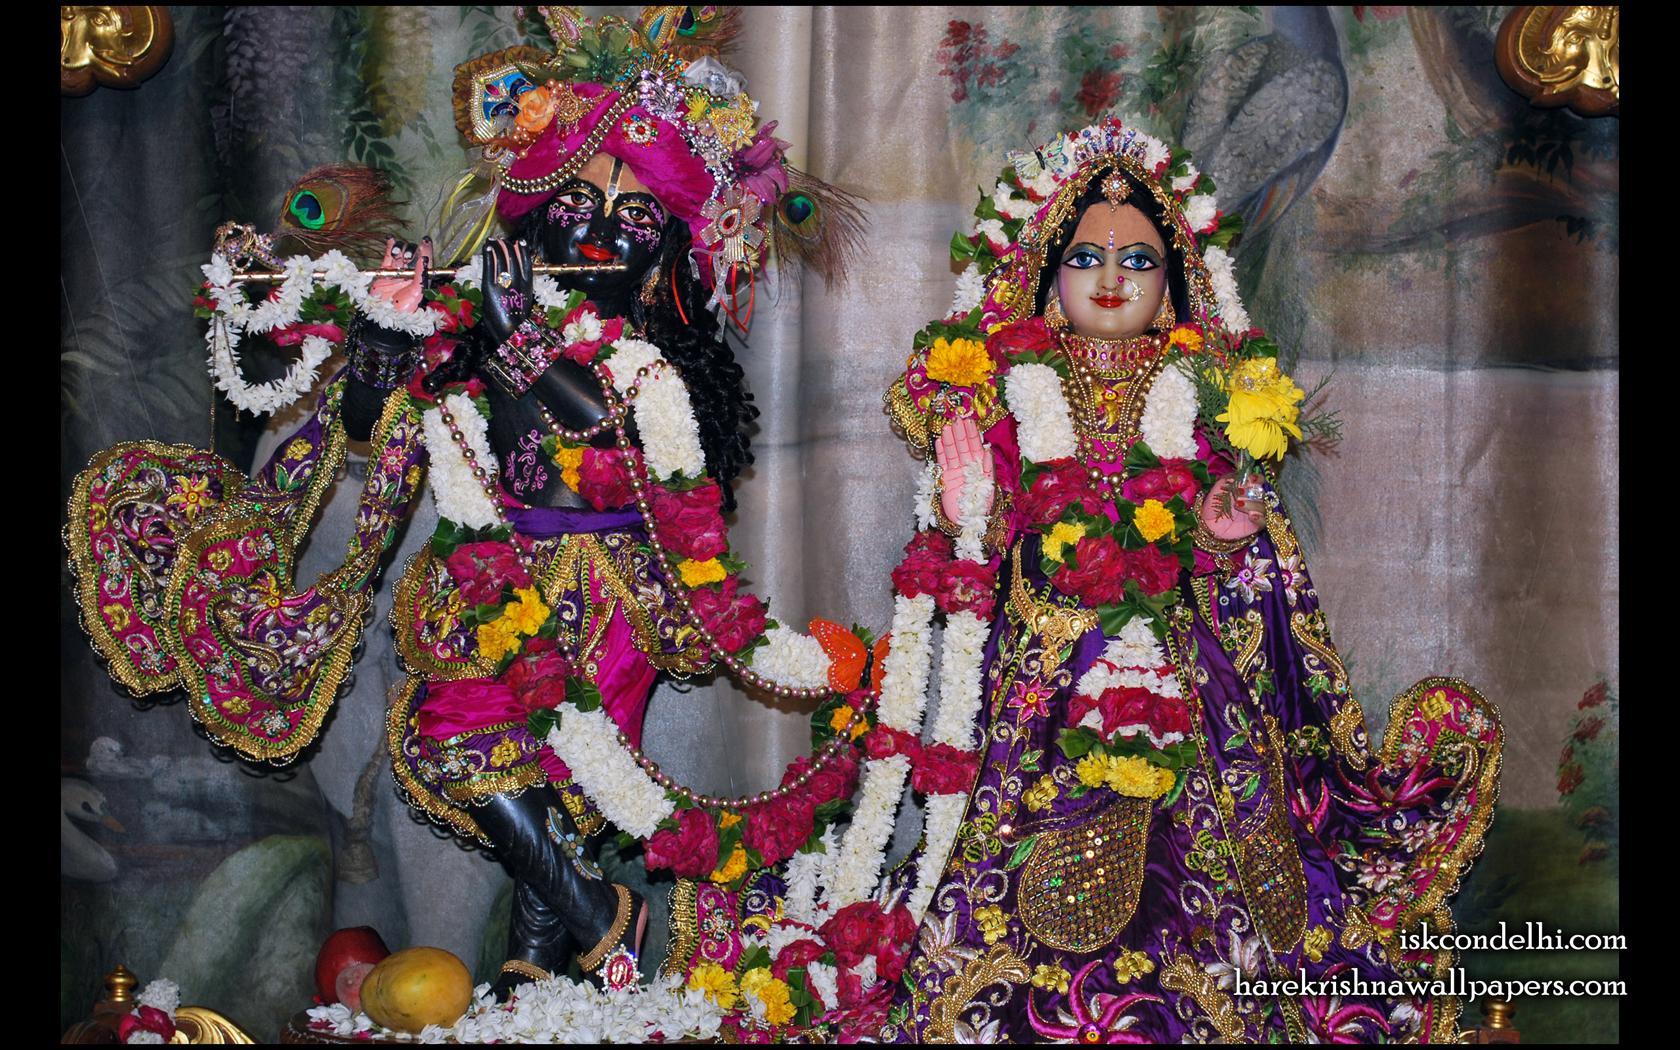 Sri Sri Radha Parthasarathi Wallpaper (002) Size 1680x1050 Download